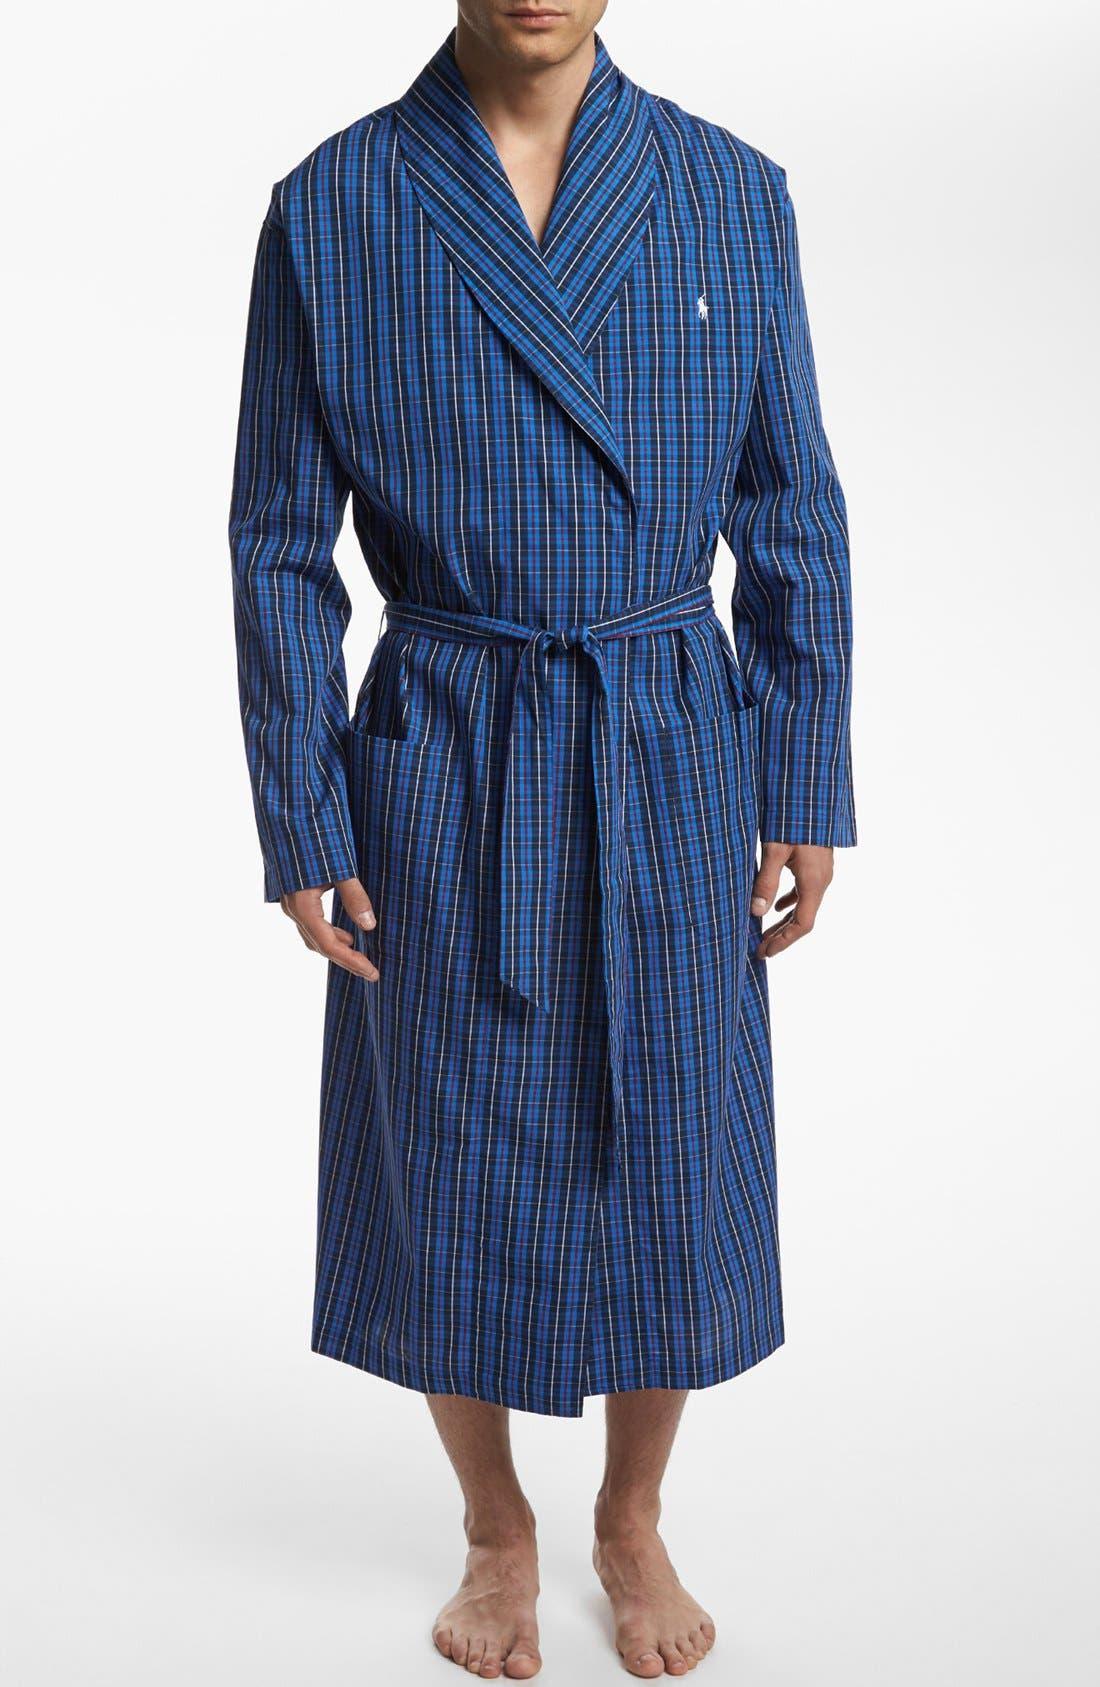 POLO RALPH LAUREN, Woven Robe, Main thumbnail 1, color, HARWICH PLAID